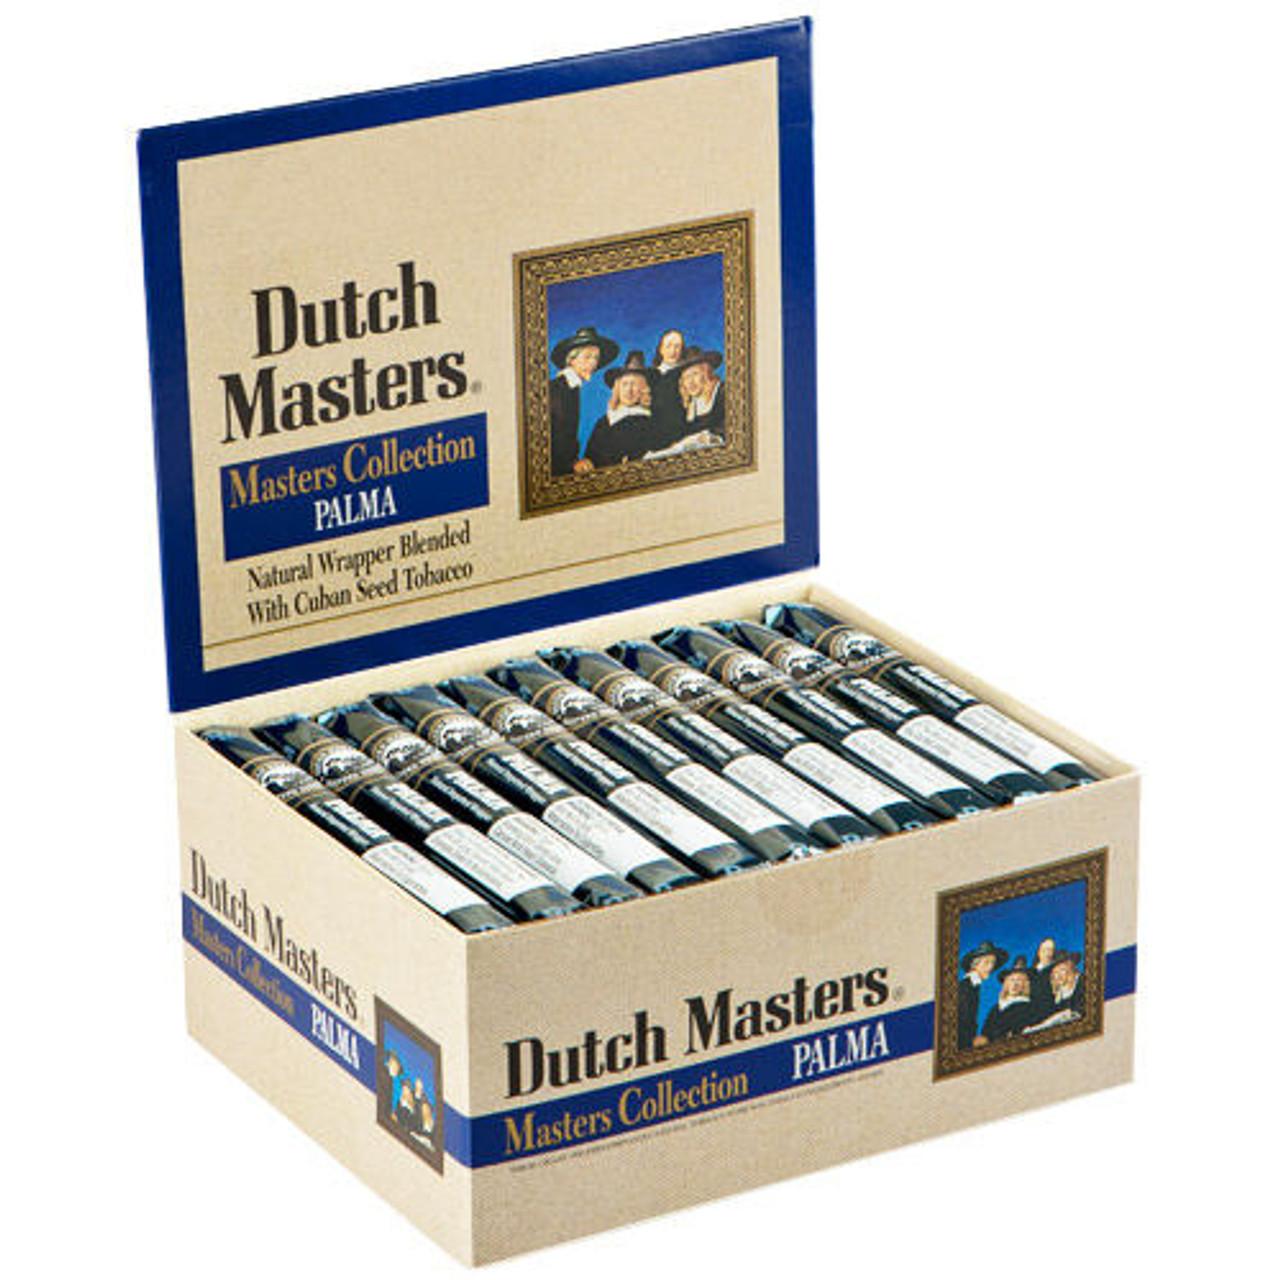 Dutch Masters Palma Cigars - 5.63 x 42 (Box of 55)